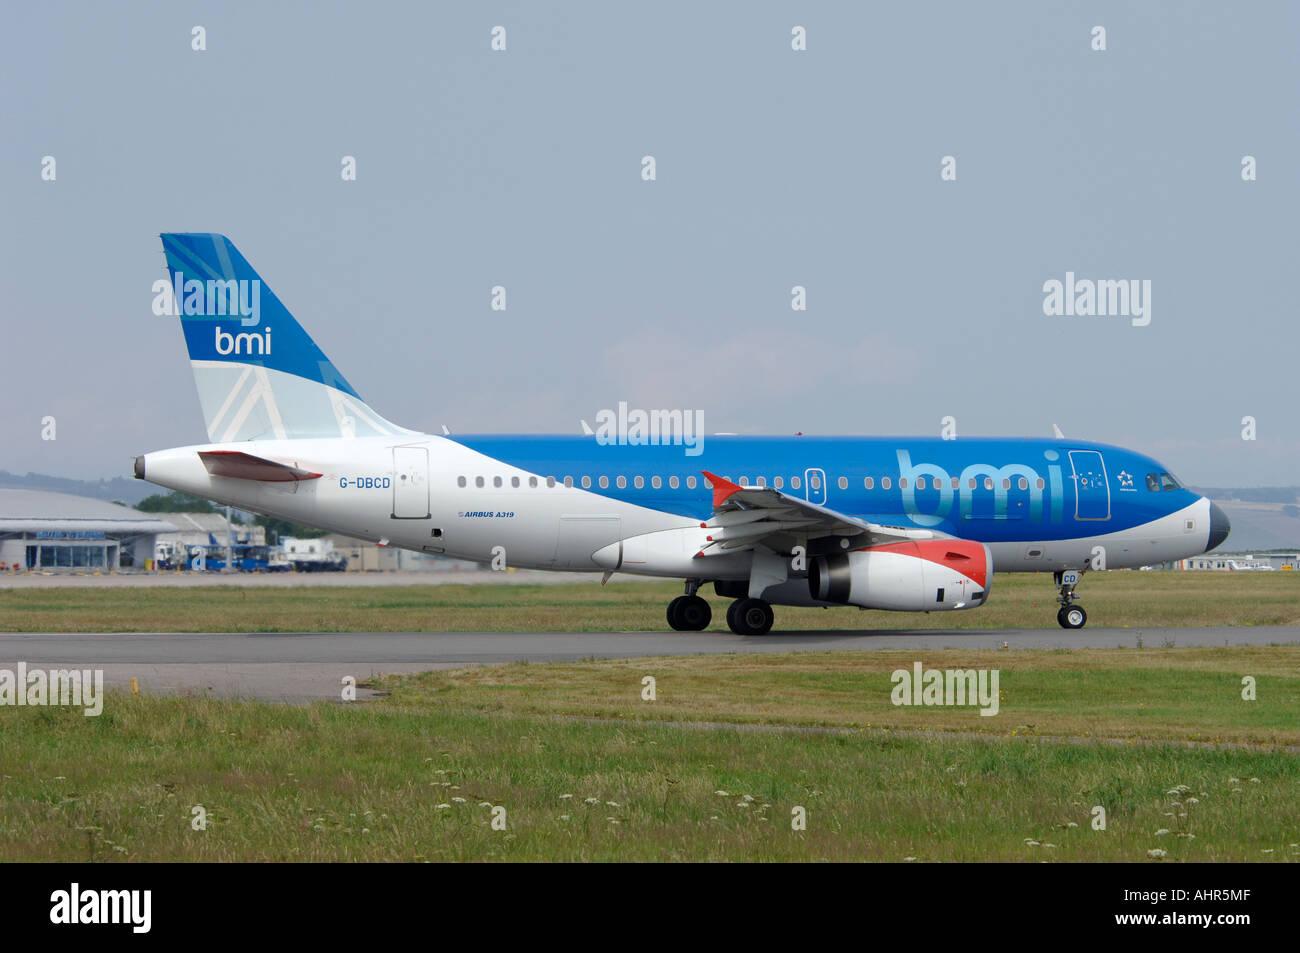 British Midland Boeing Airbus 319 Civil Passenger Airliner.  G-DBCD - Stock Image